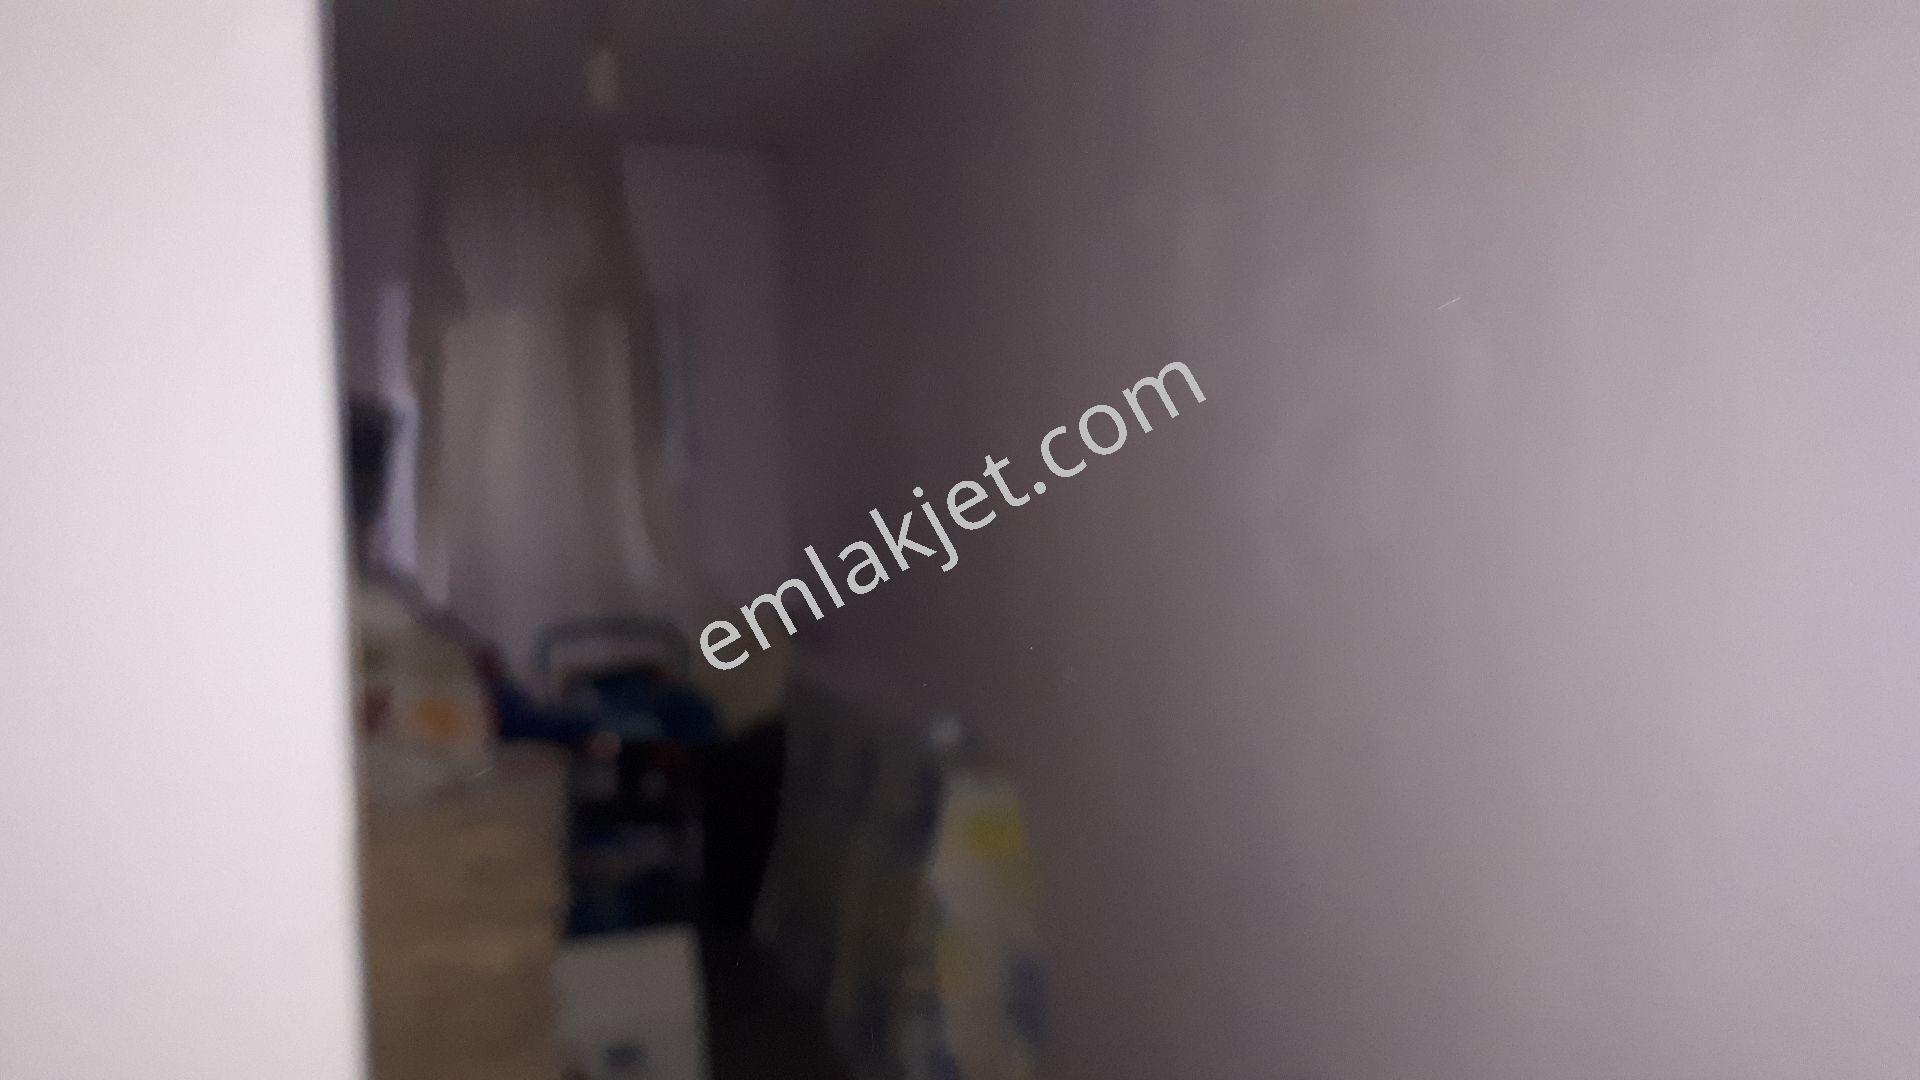 https://imaj.emlakjet.com/listing/7505812/0288138FBB680E269E64648895C344907505812.jpg